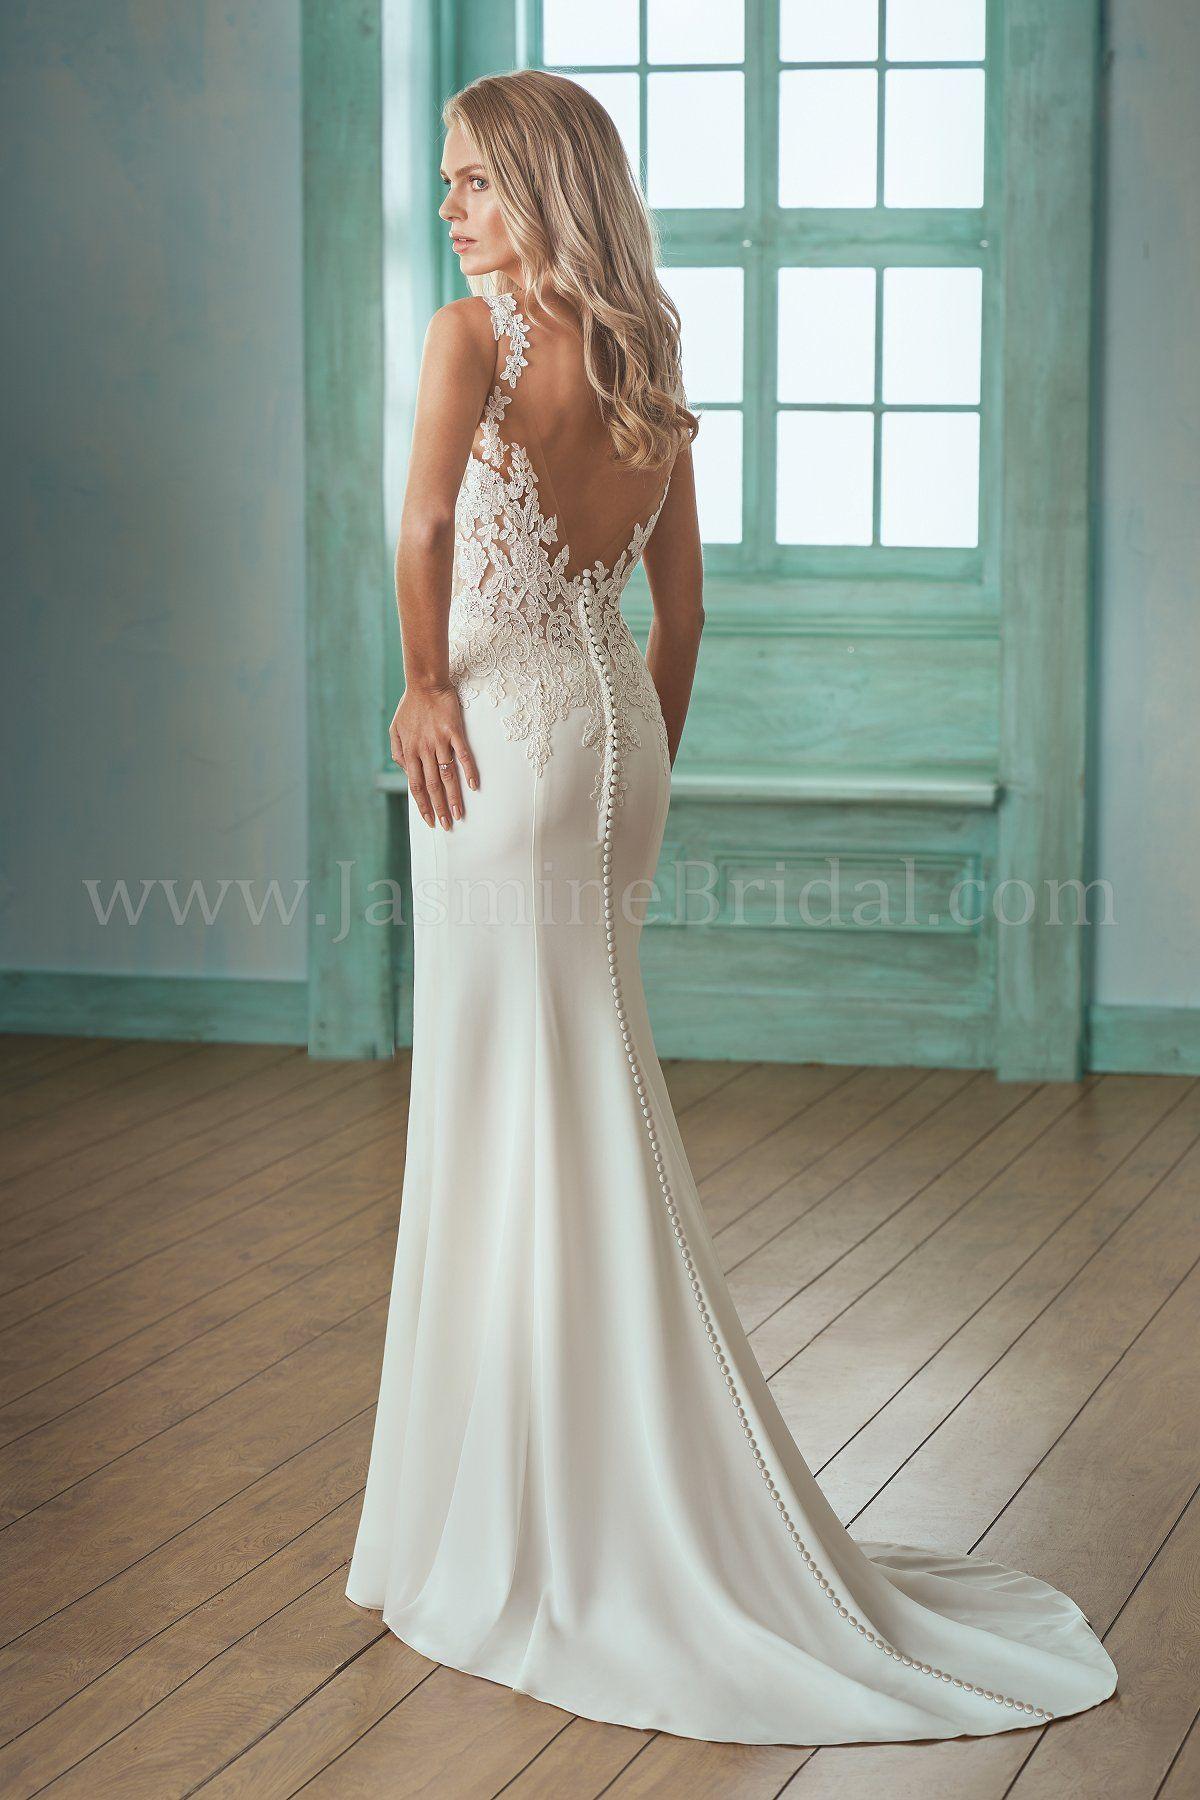 Jasmine wedding dresses  F Illusion Neckline Lace u Crepe Wedding Dress  Wedding